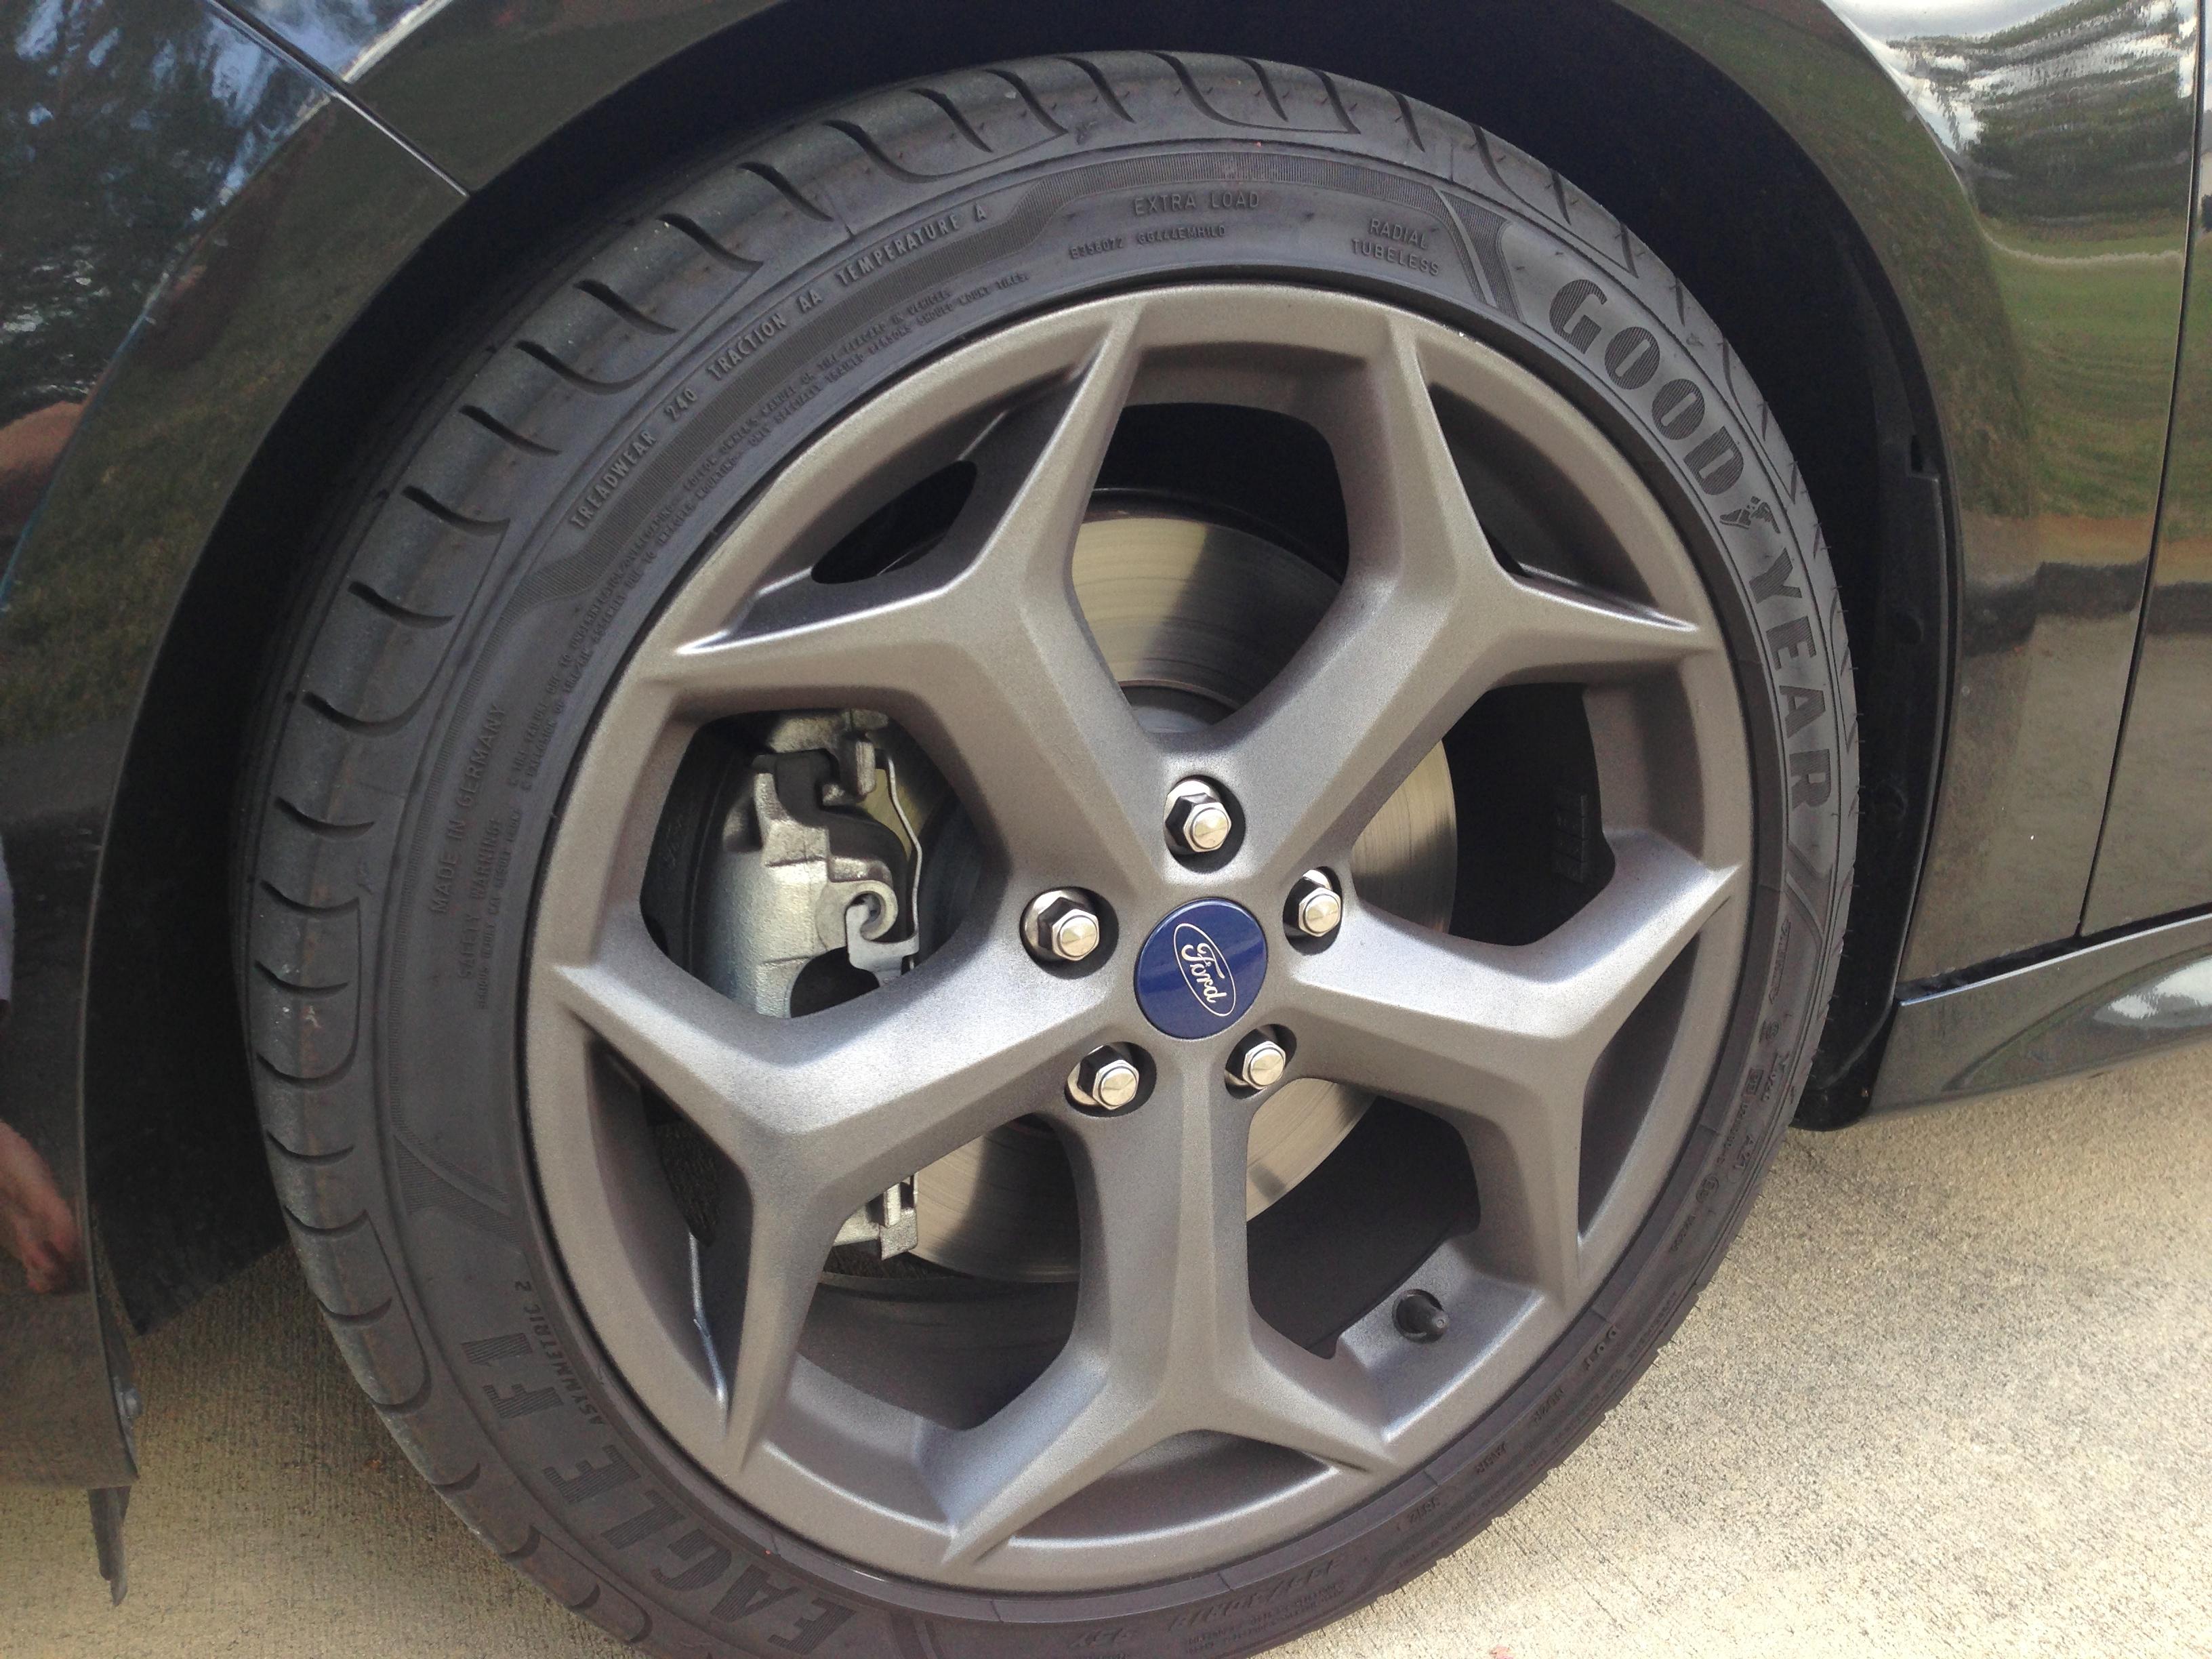 Plastidip Wheelpaint Success